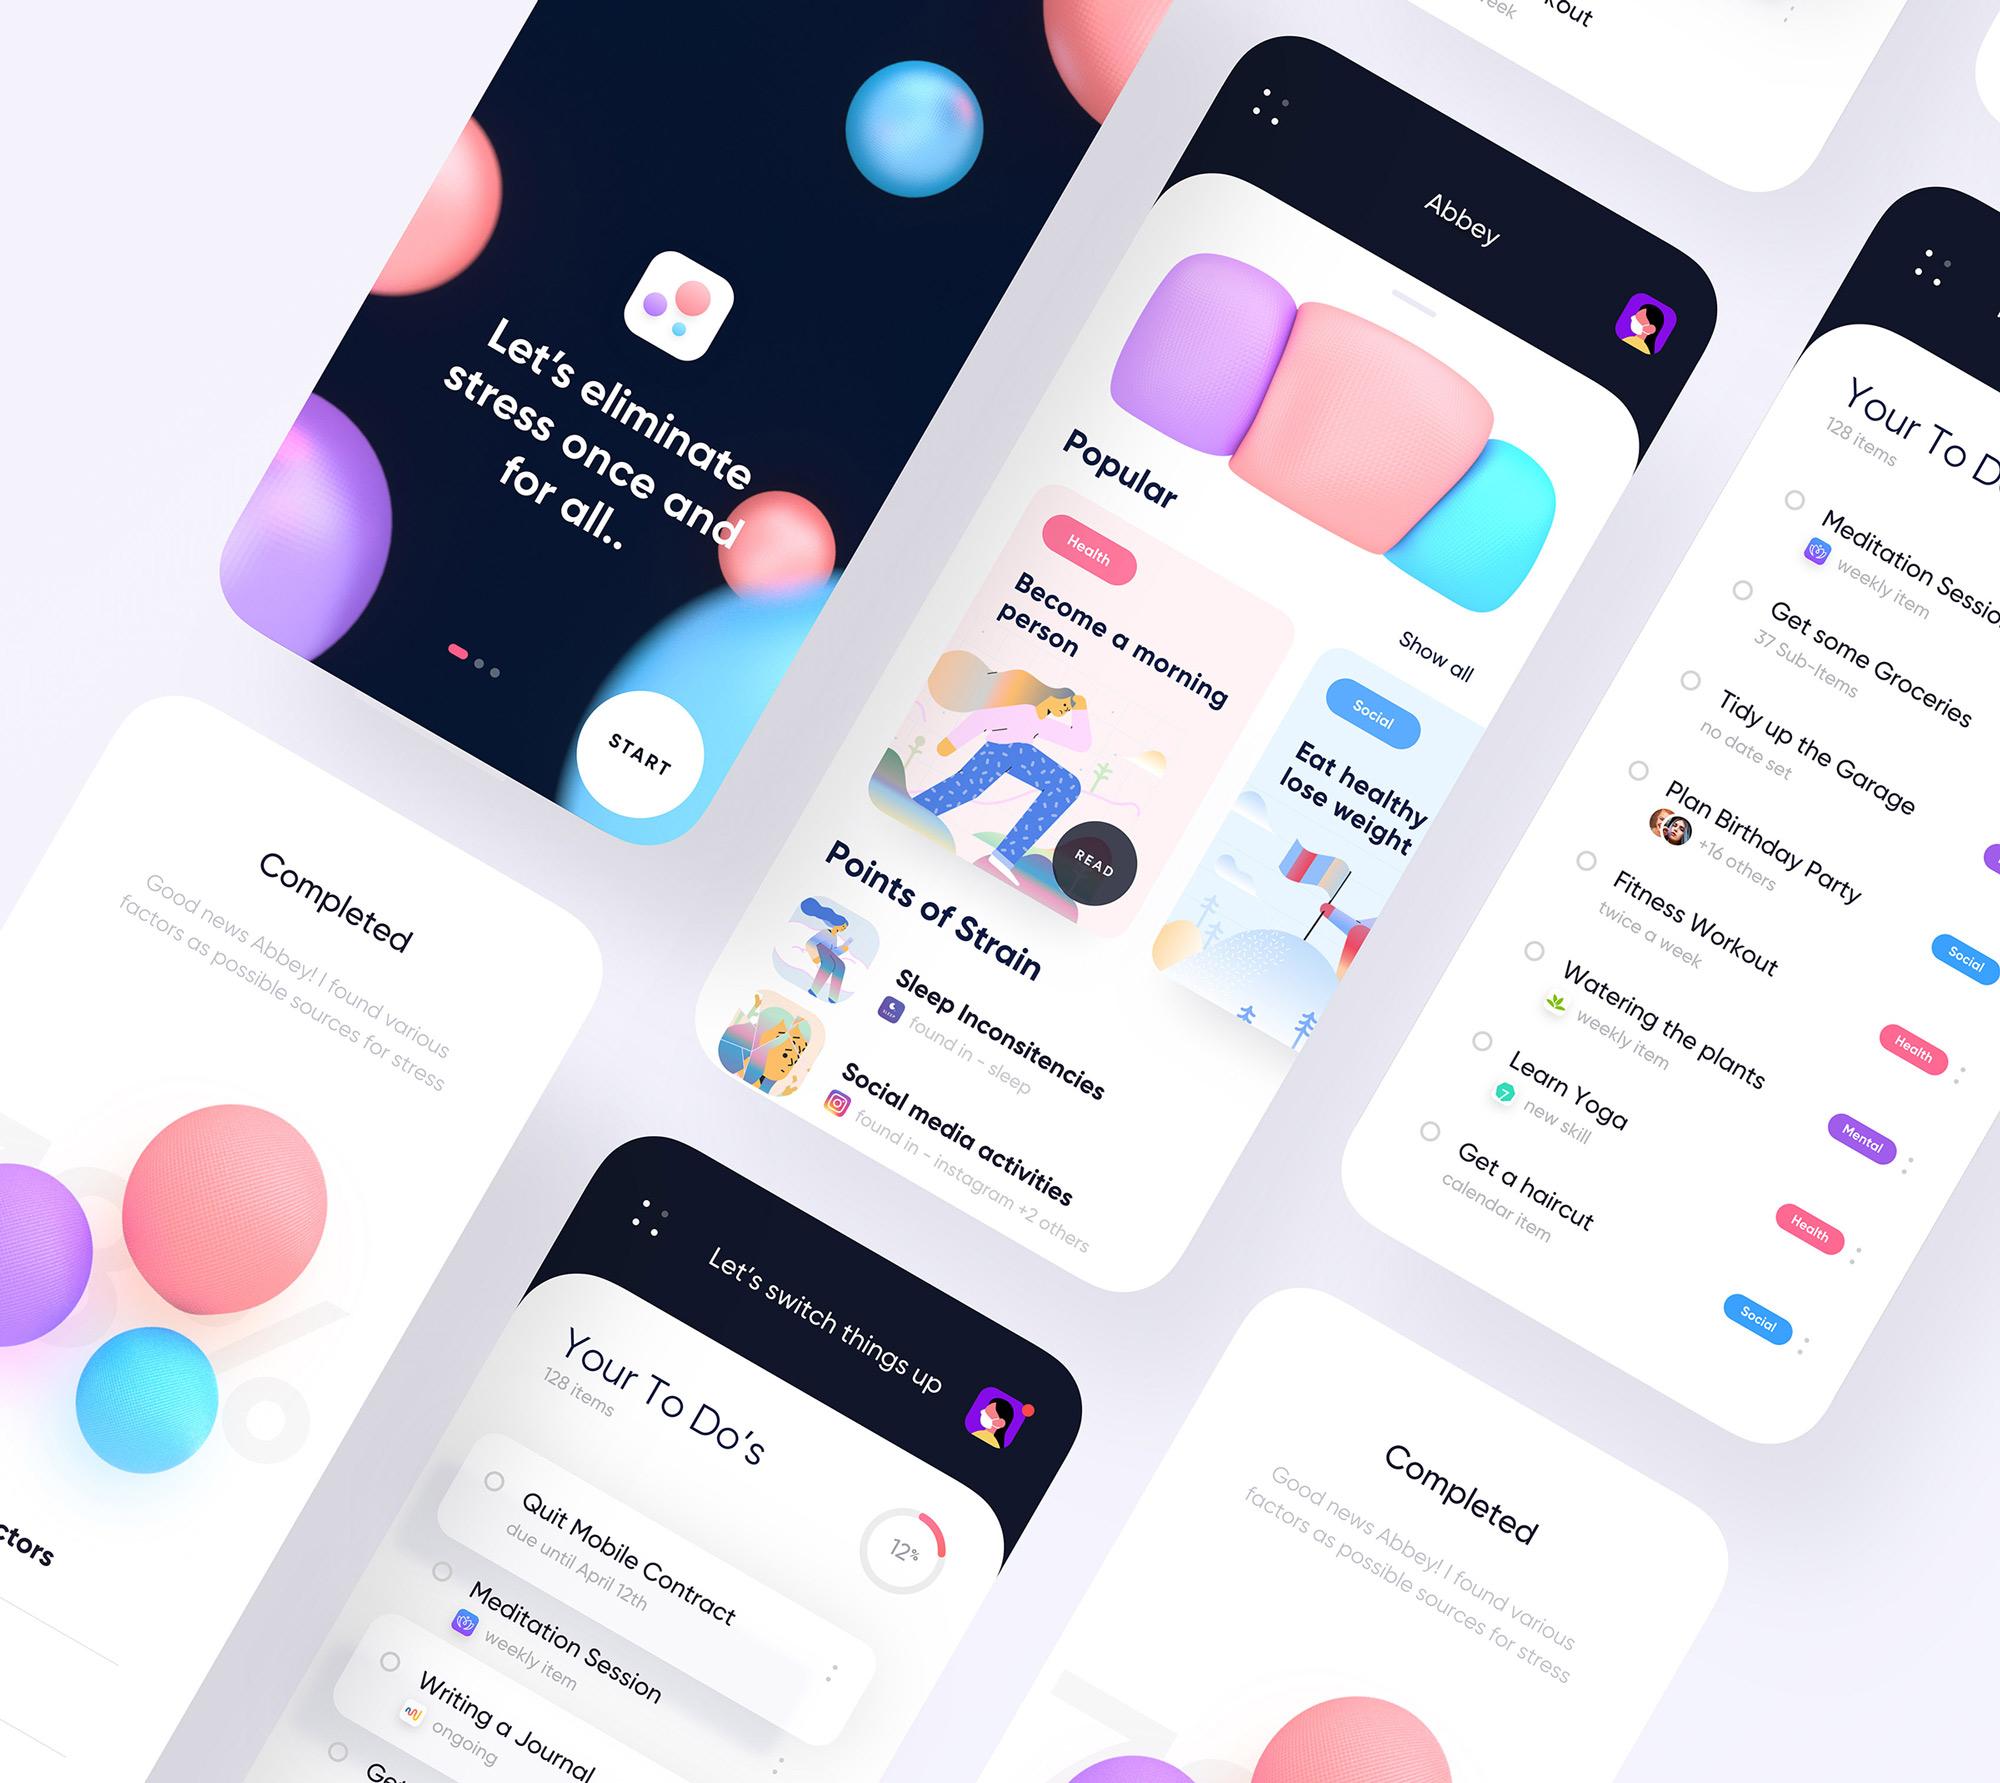 A Image showing Multiple App Screens of Snug App